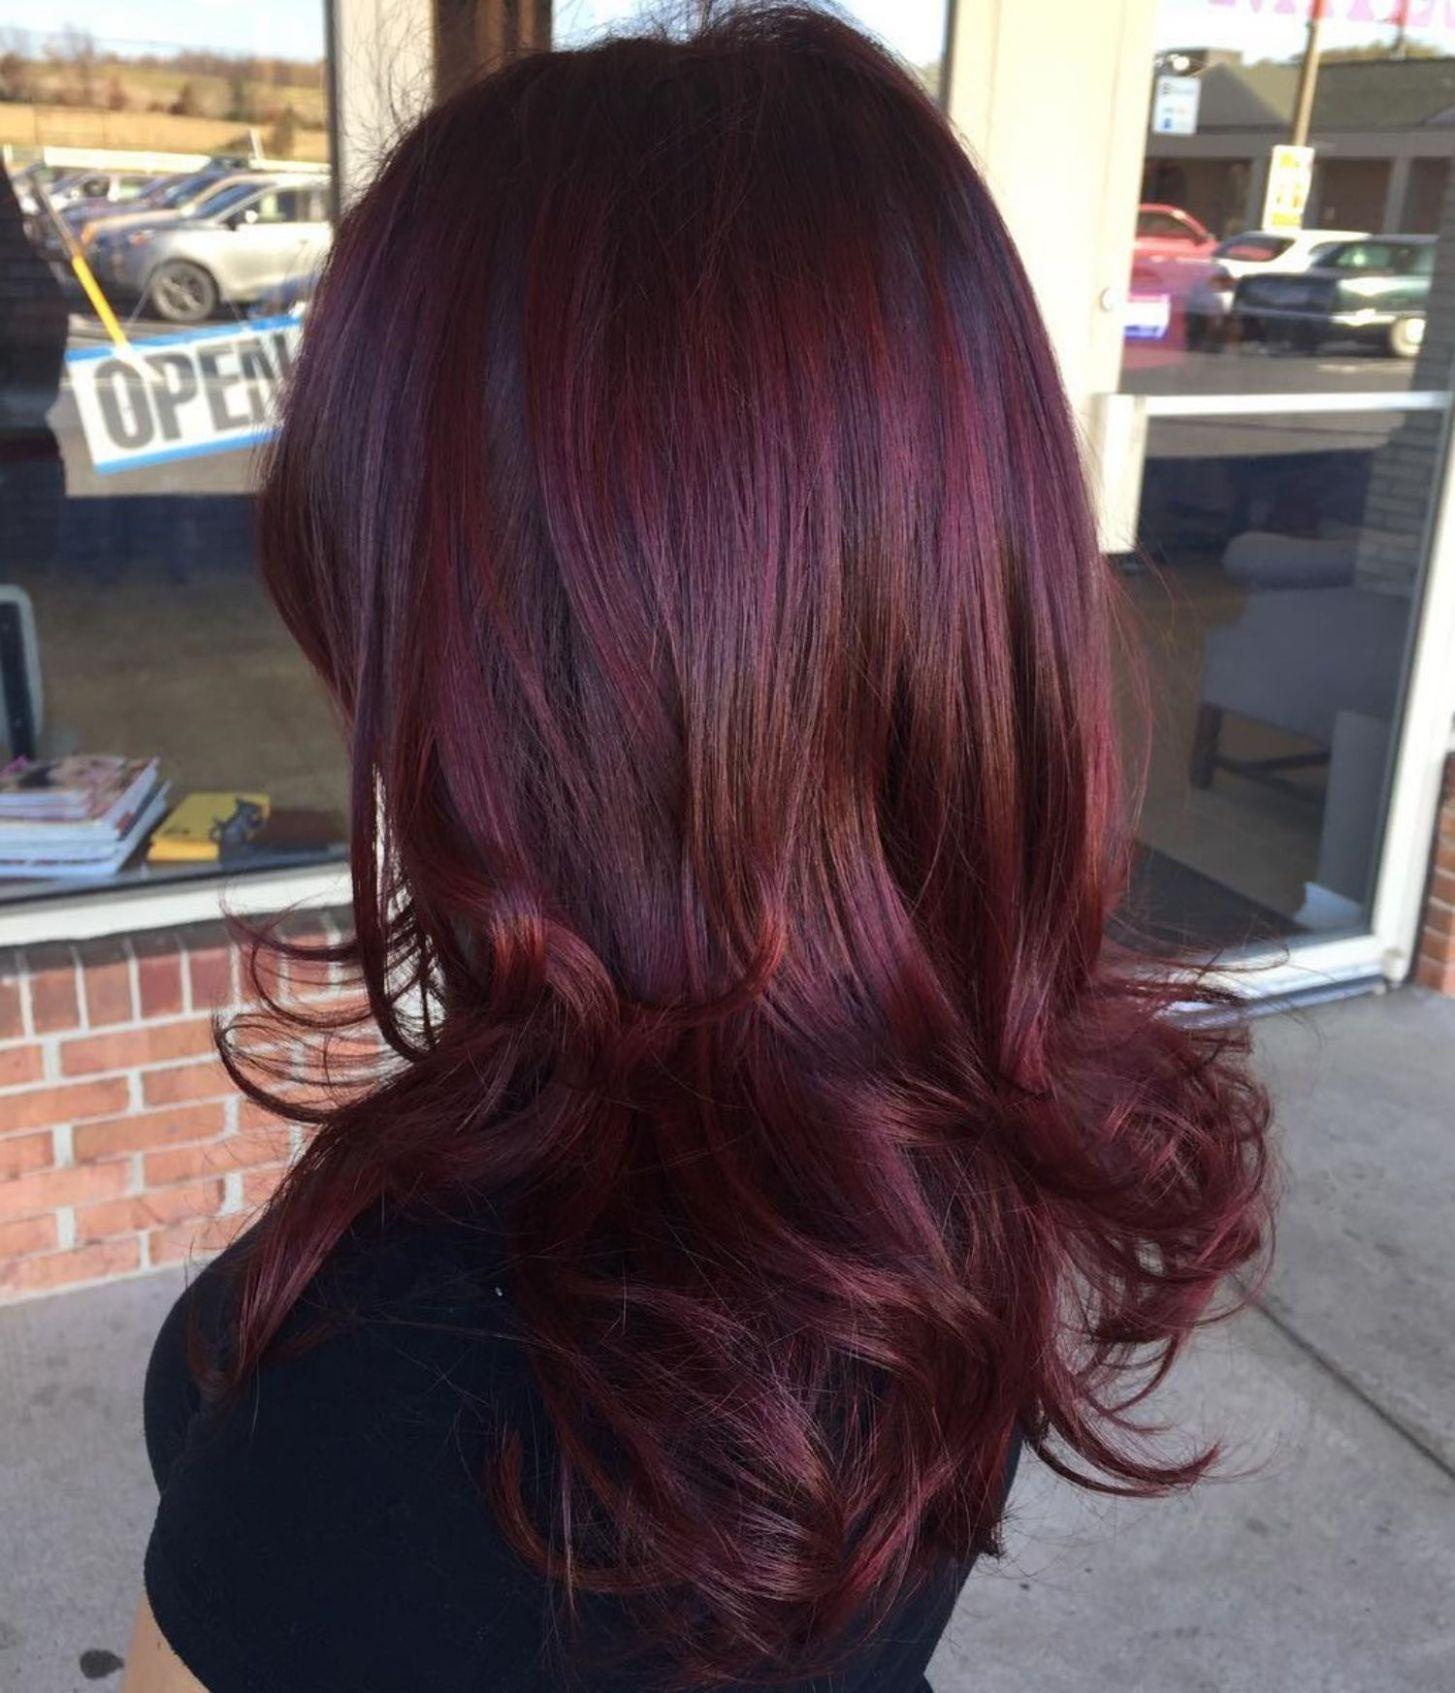 Winter Hair Color Ideas For Brunettes: 45 Shades Of Burgundy Hair : Dark Burgundy, Maroon